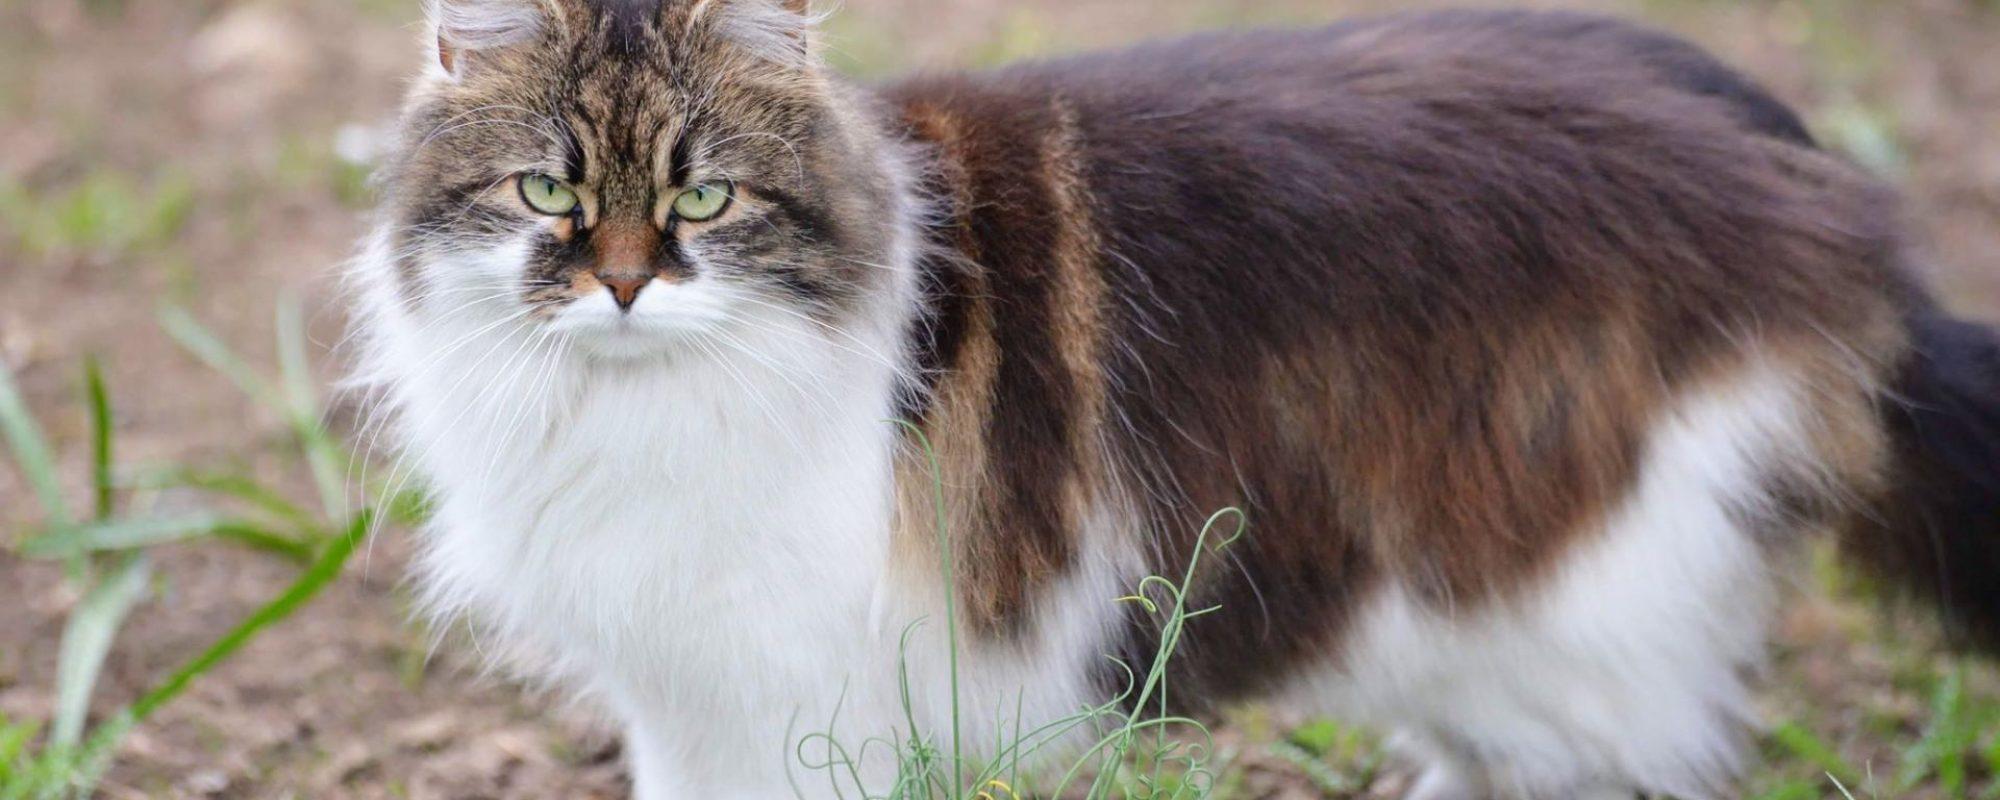 gotlands-djurpark-eskelhem-katt-9